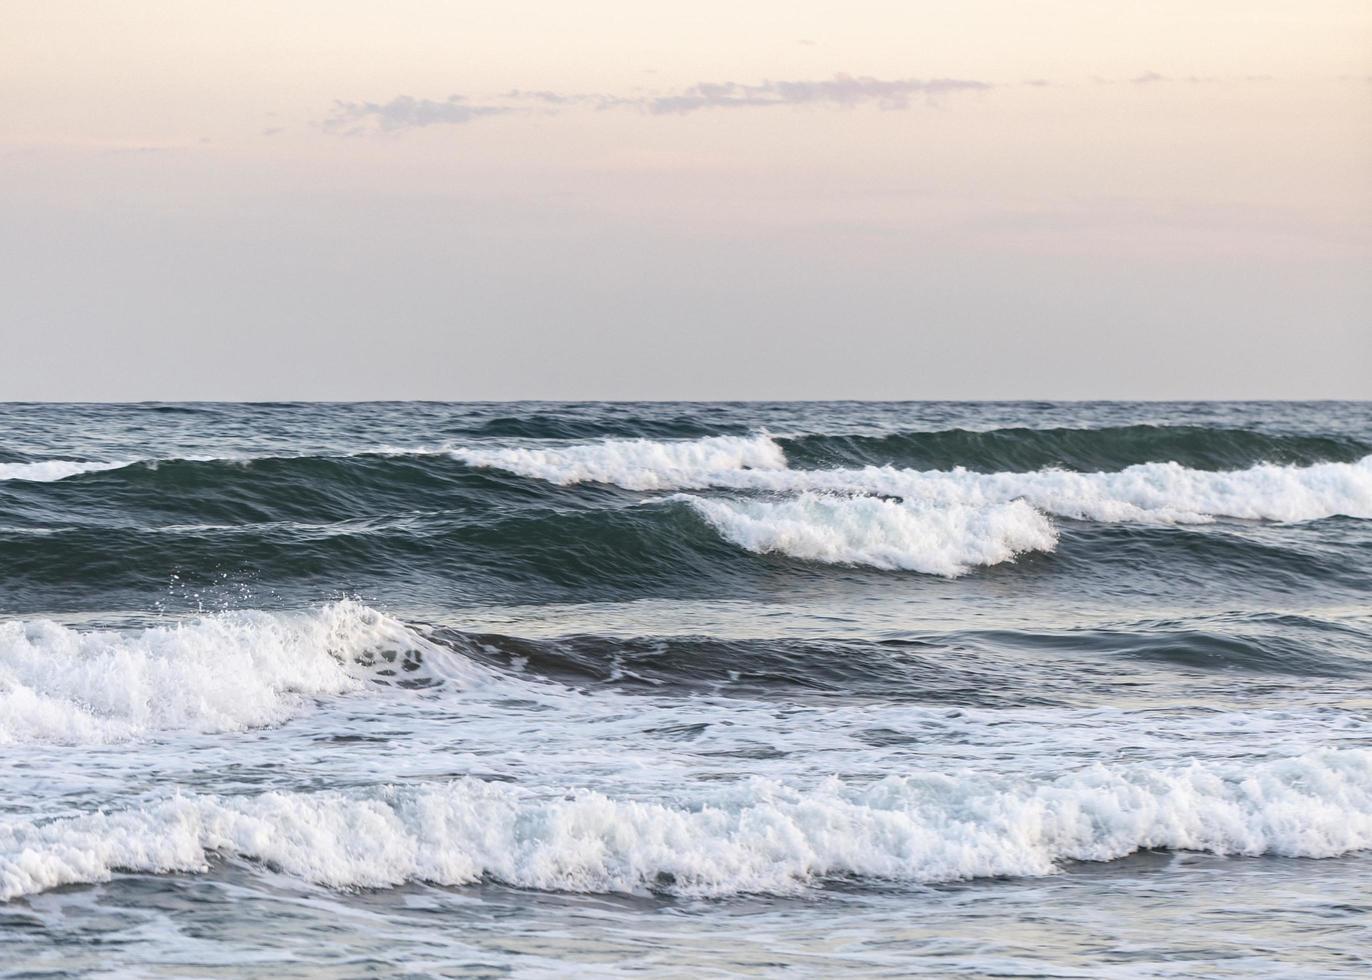 olas del mar playa foto